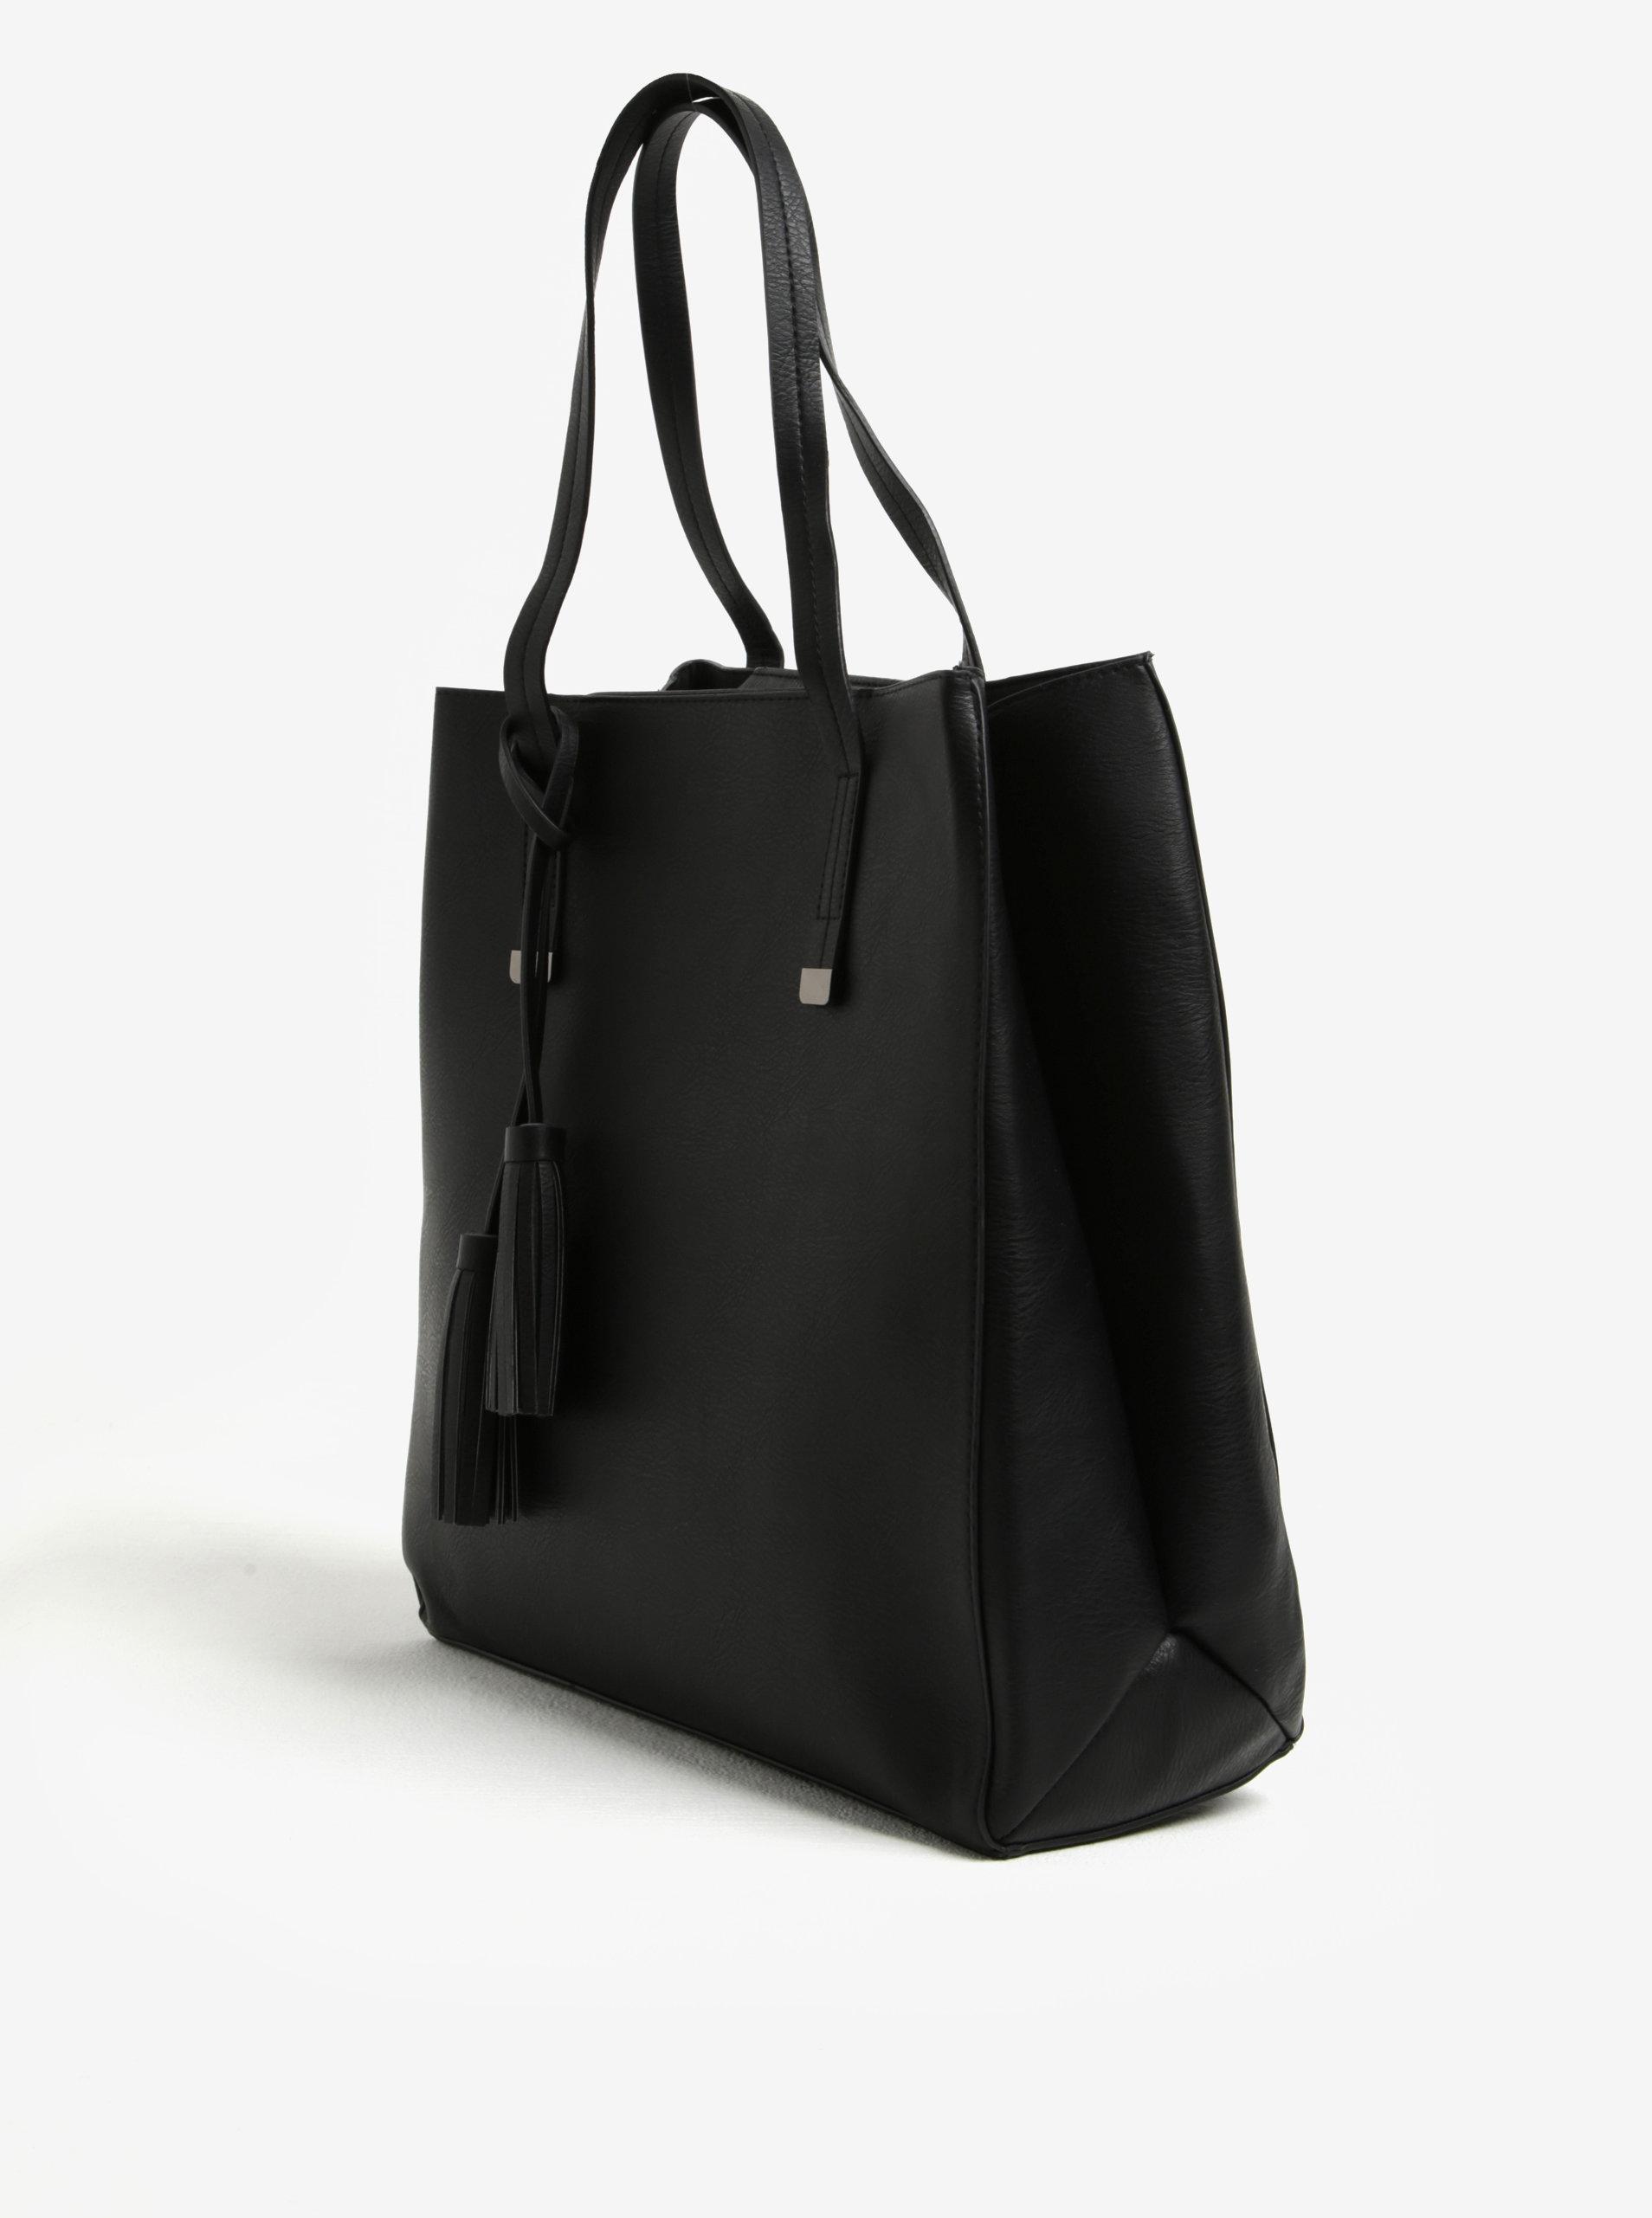 Čierna kabelka so strapcami Pieces Reagan ... 77c781b1e65